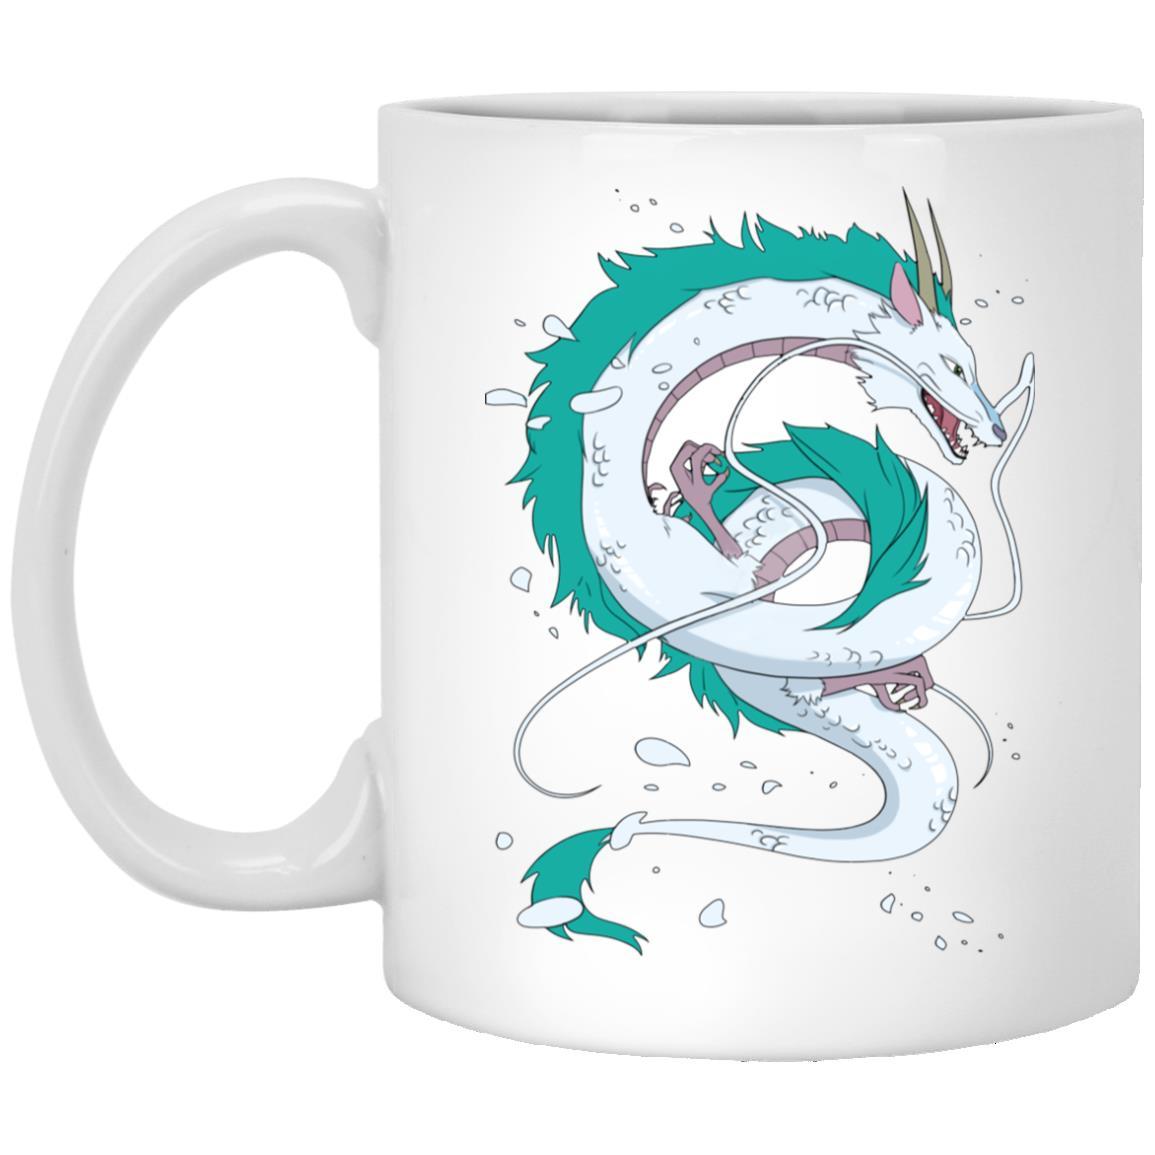 Haku Dragon Mug